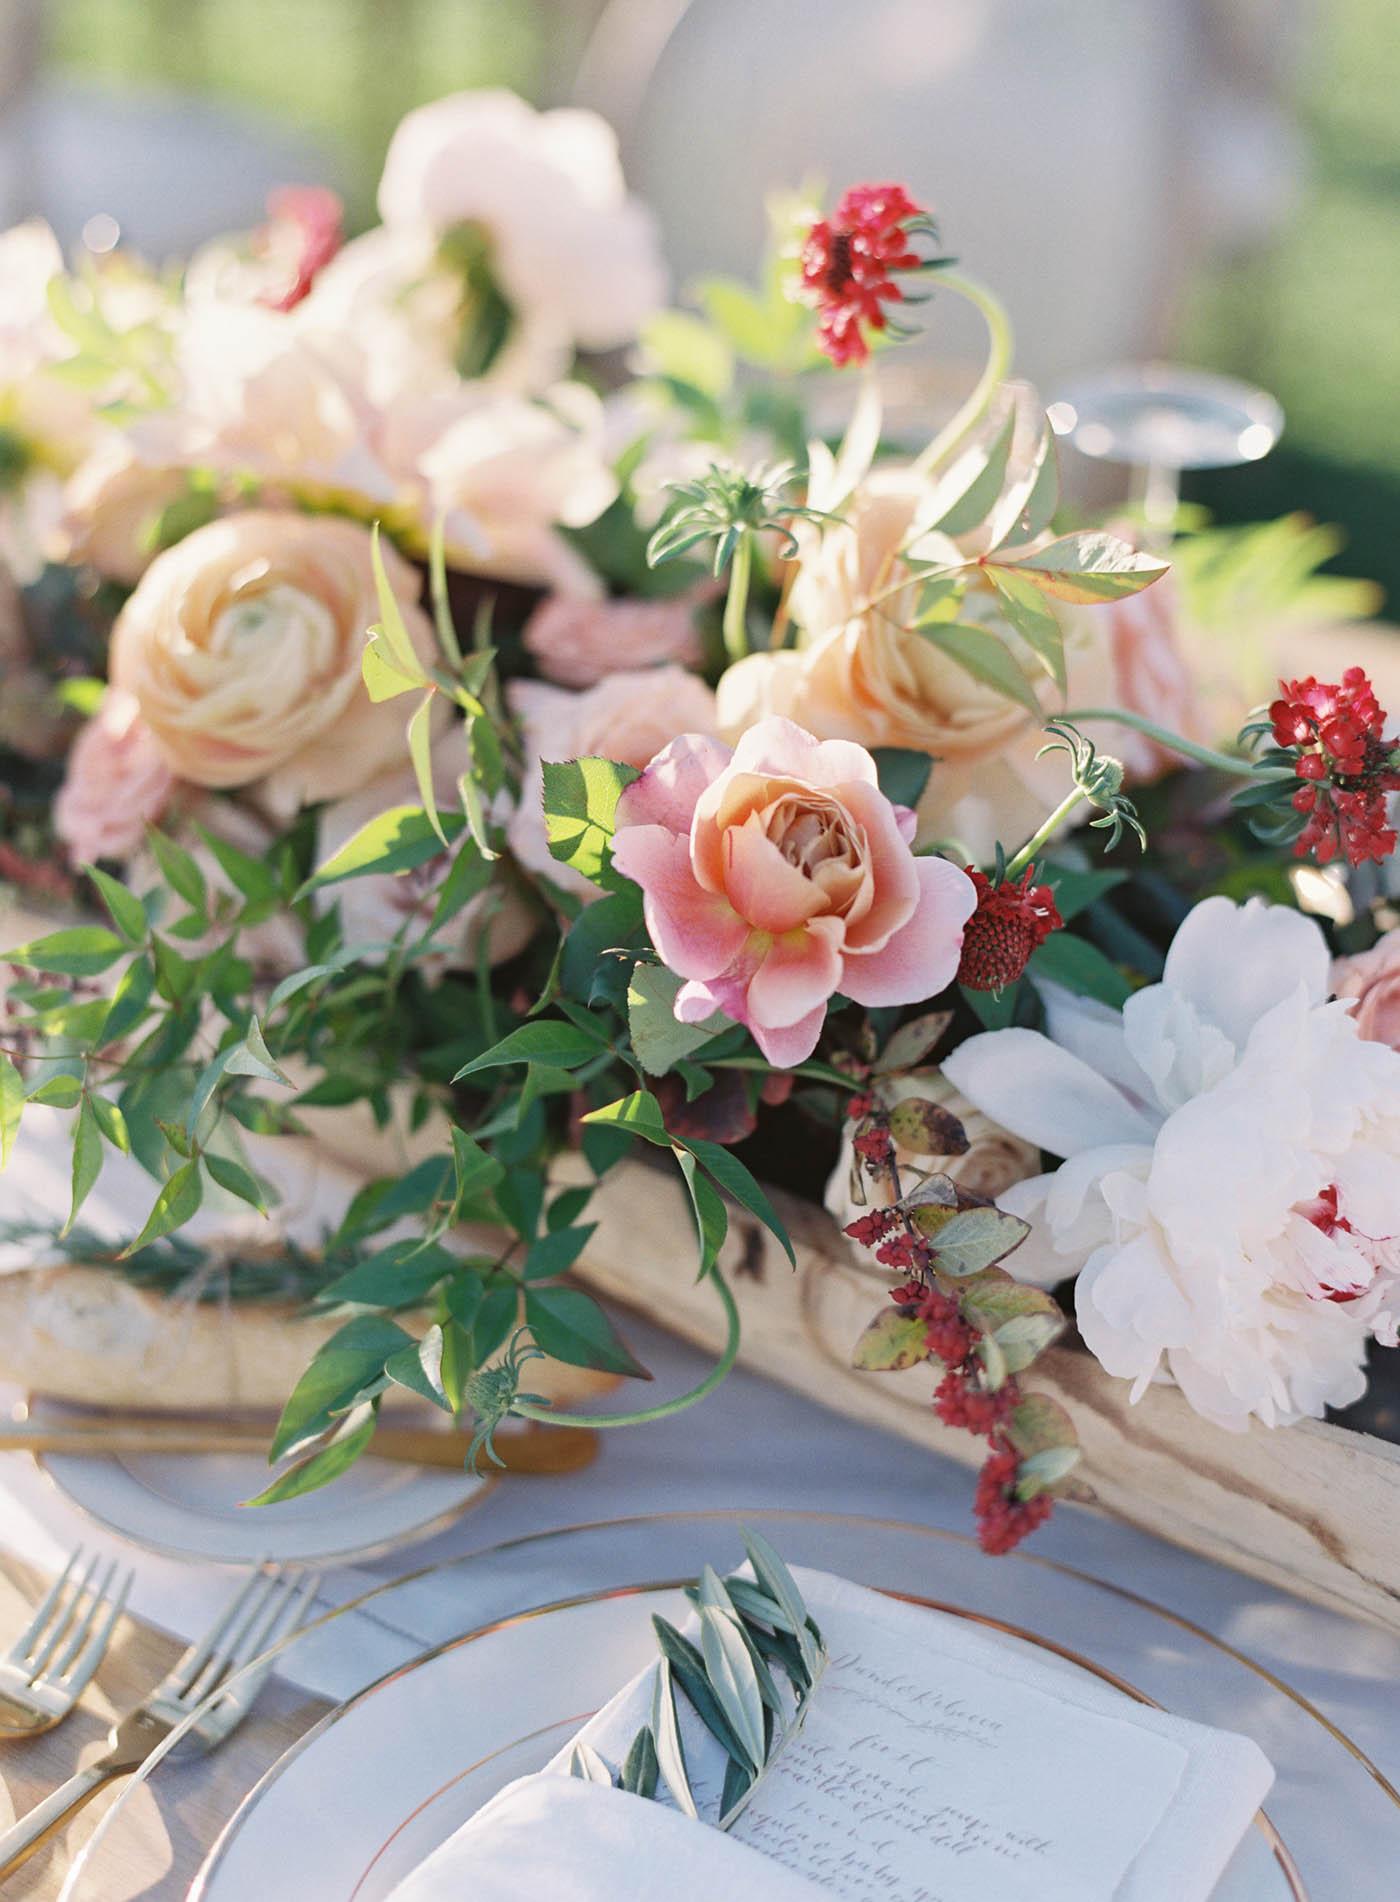 sunstone-villa-wedding-29-Jen_Huang-RD-175-Jen_Huang-009590-R1-009.jpg